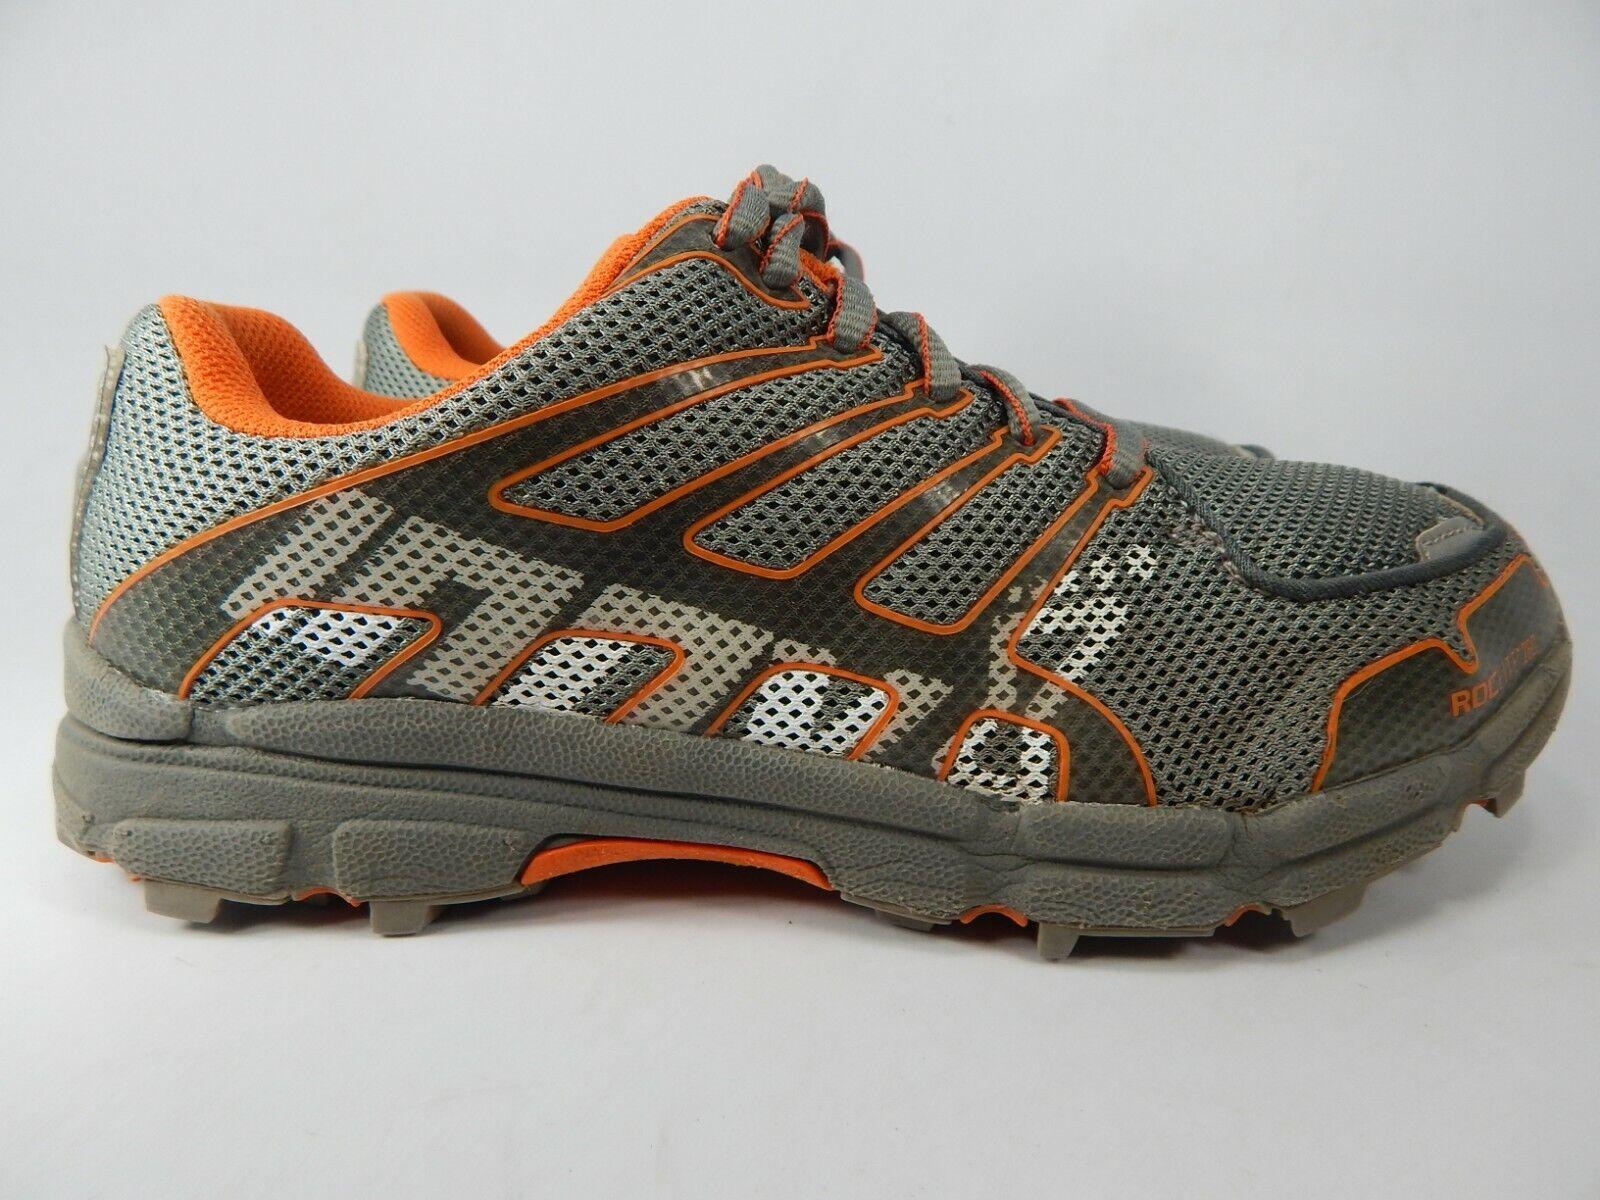 Inov-8 Roclite 260 Size 8 M (B) Women's Trail Running shoes Grey FO128